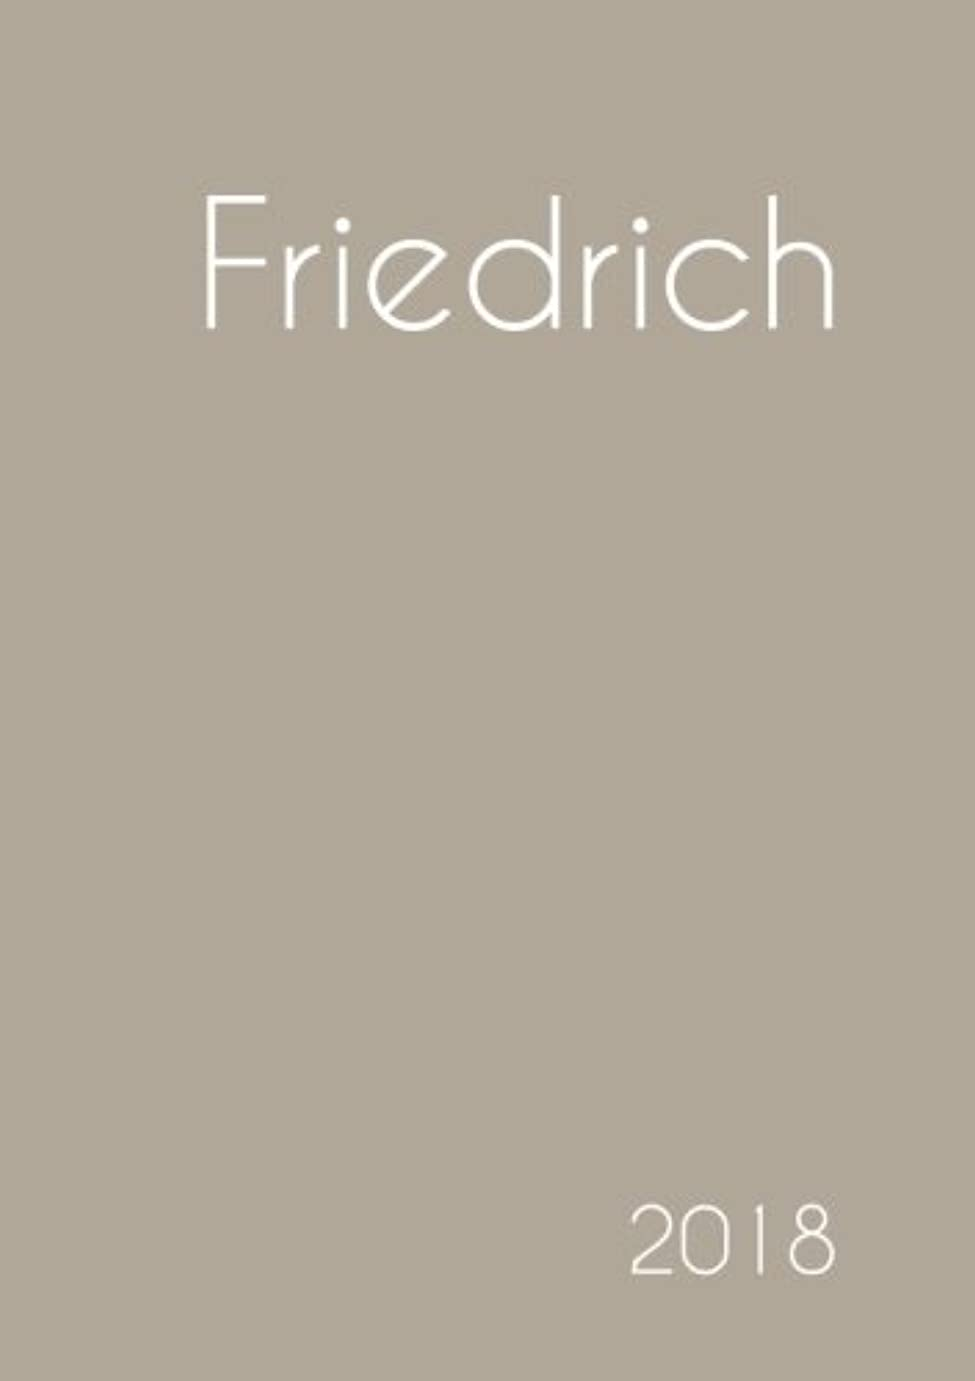 蒸し器バラ色憂鬱2018: Namenskalender 2018 - Friedrich - DIN A5 - eine Woche pro Doppelseite